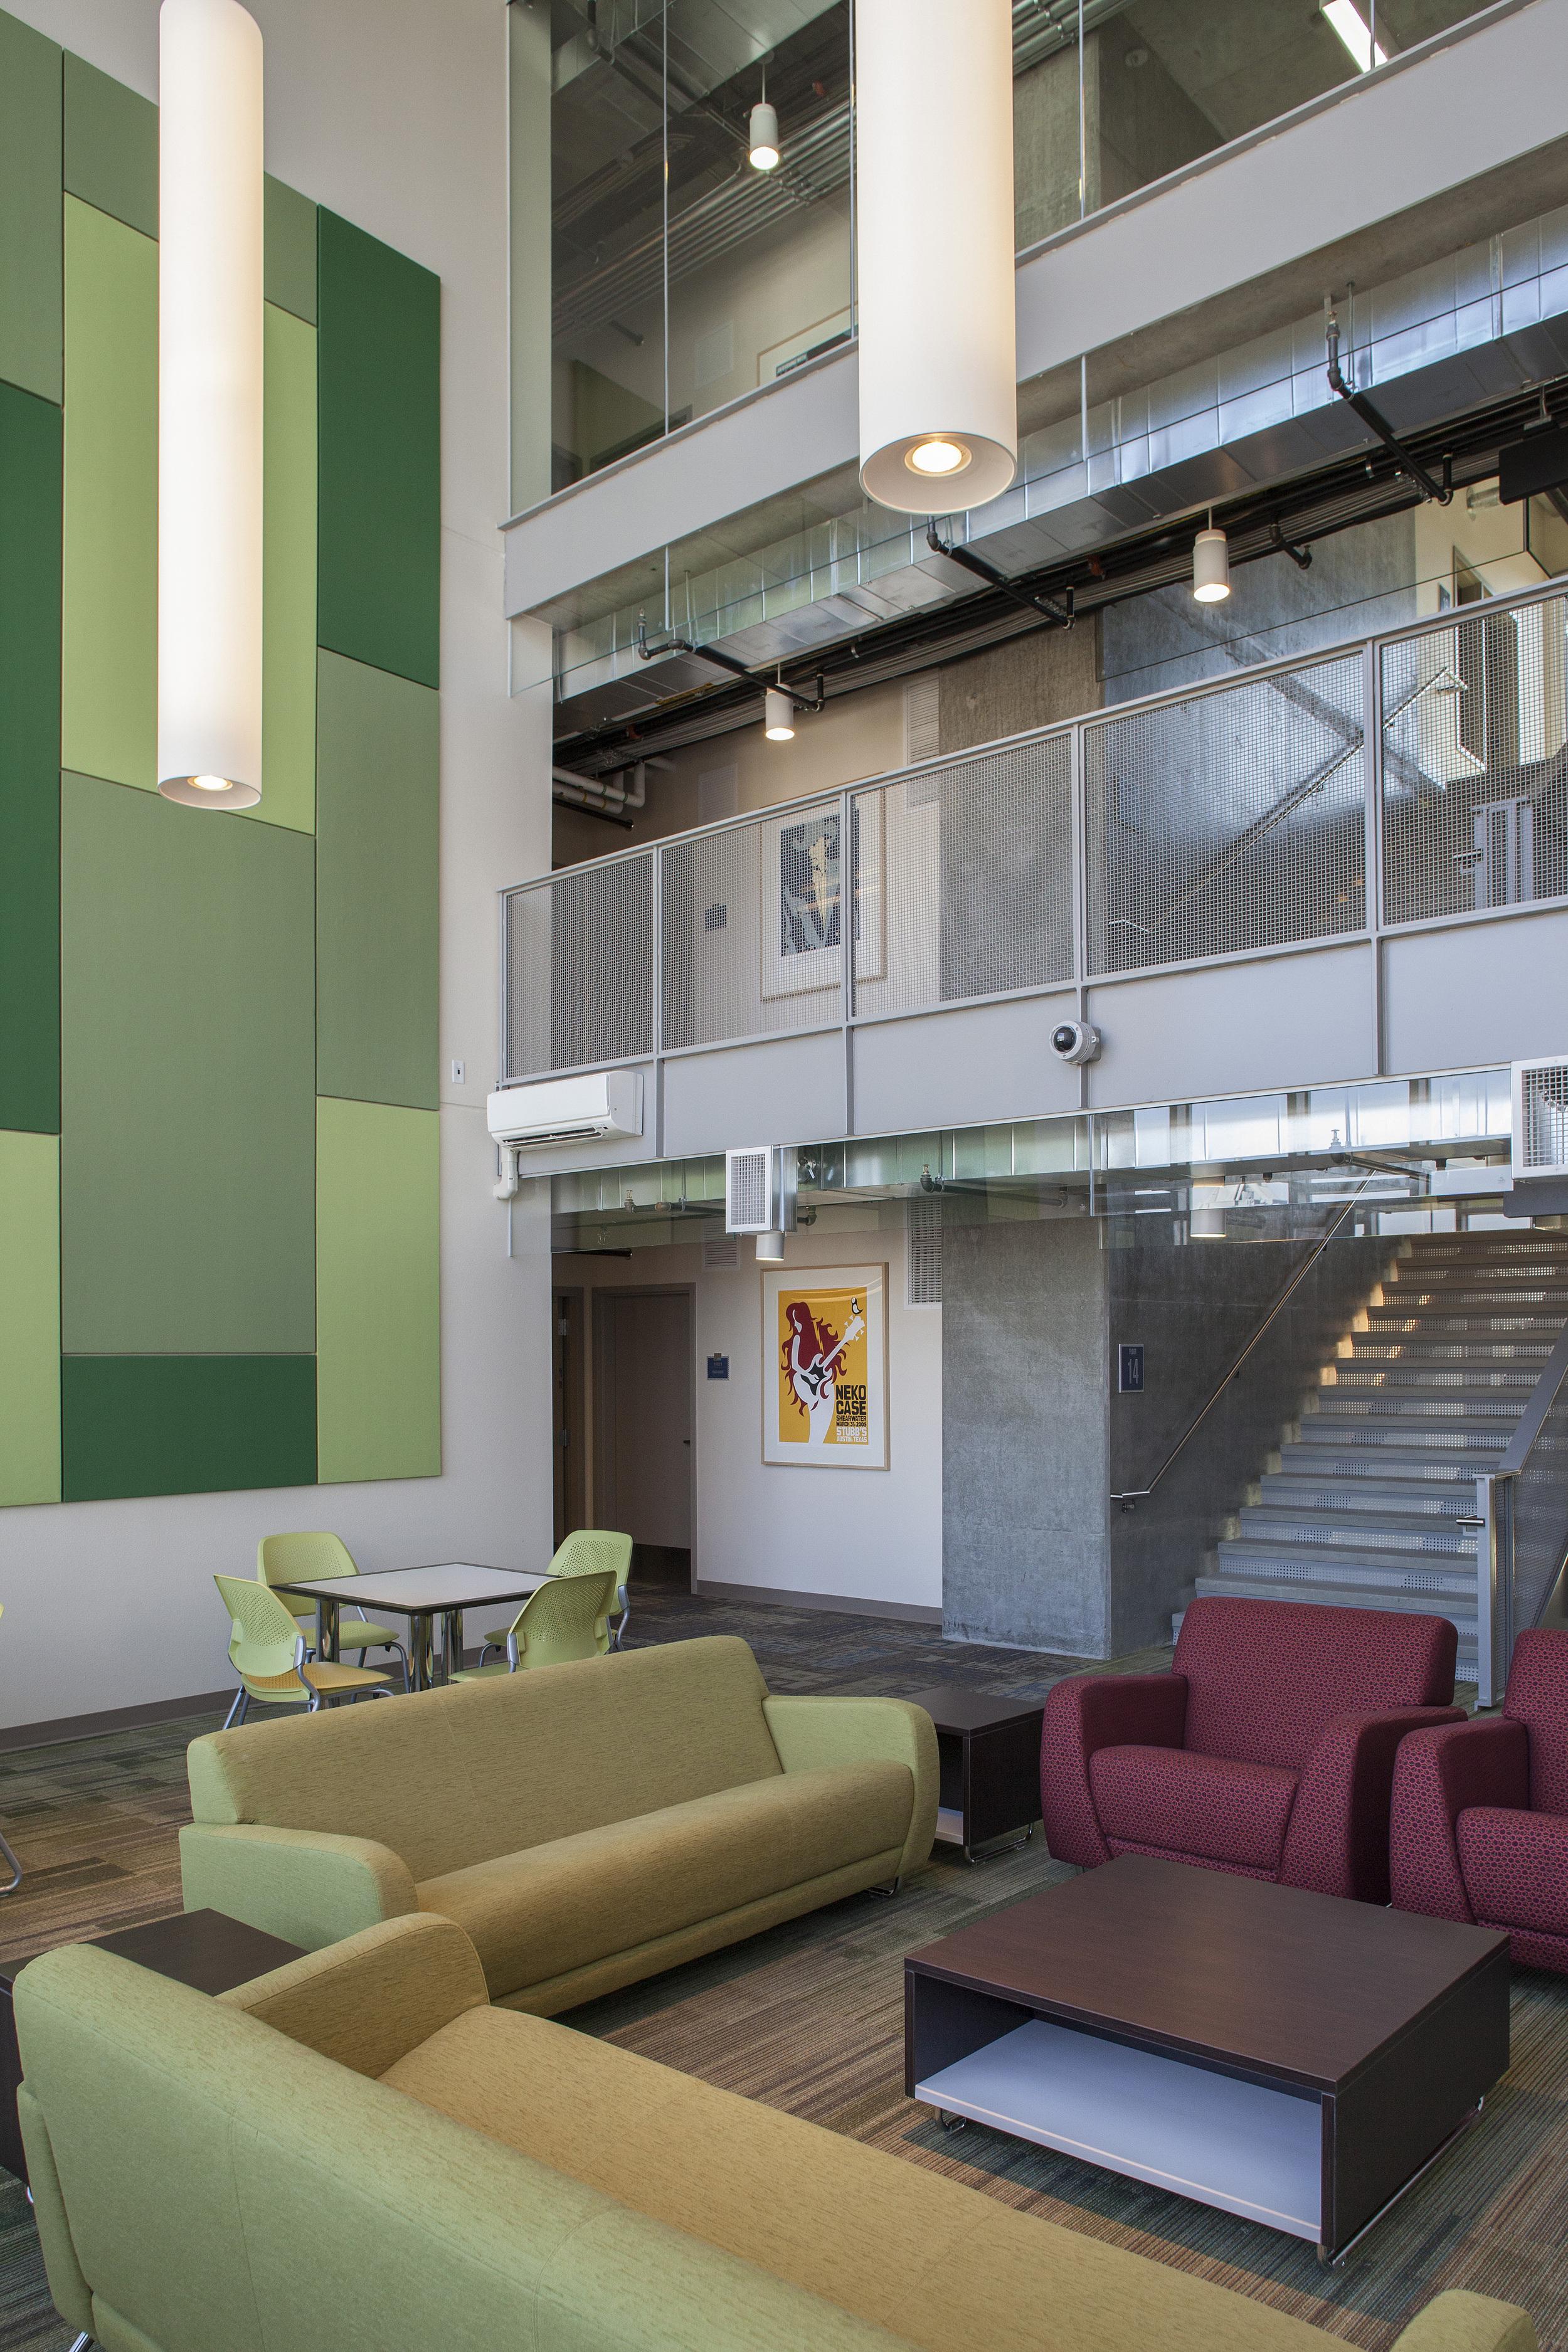 University Pointe PSU_Neighborhood Lounge_Sixthriver Architects.jpg